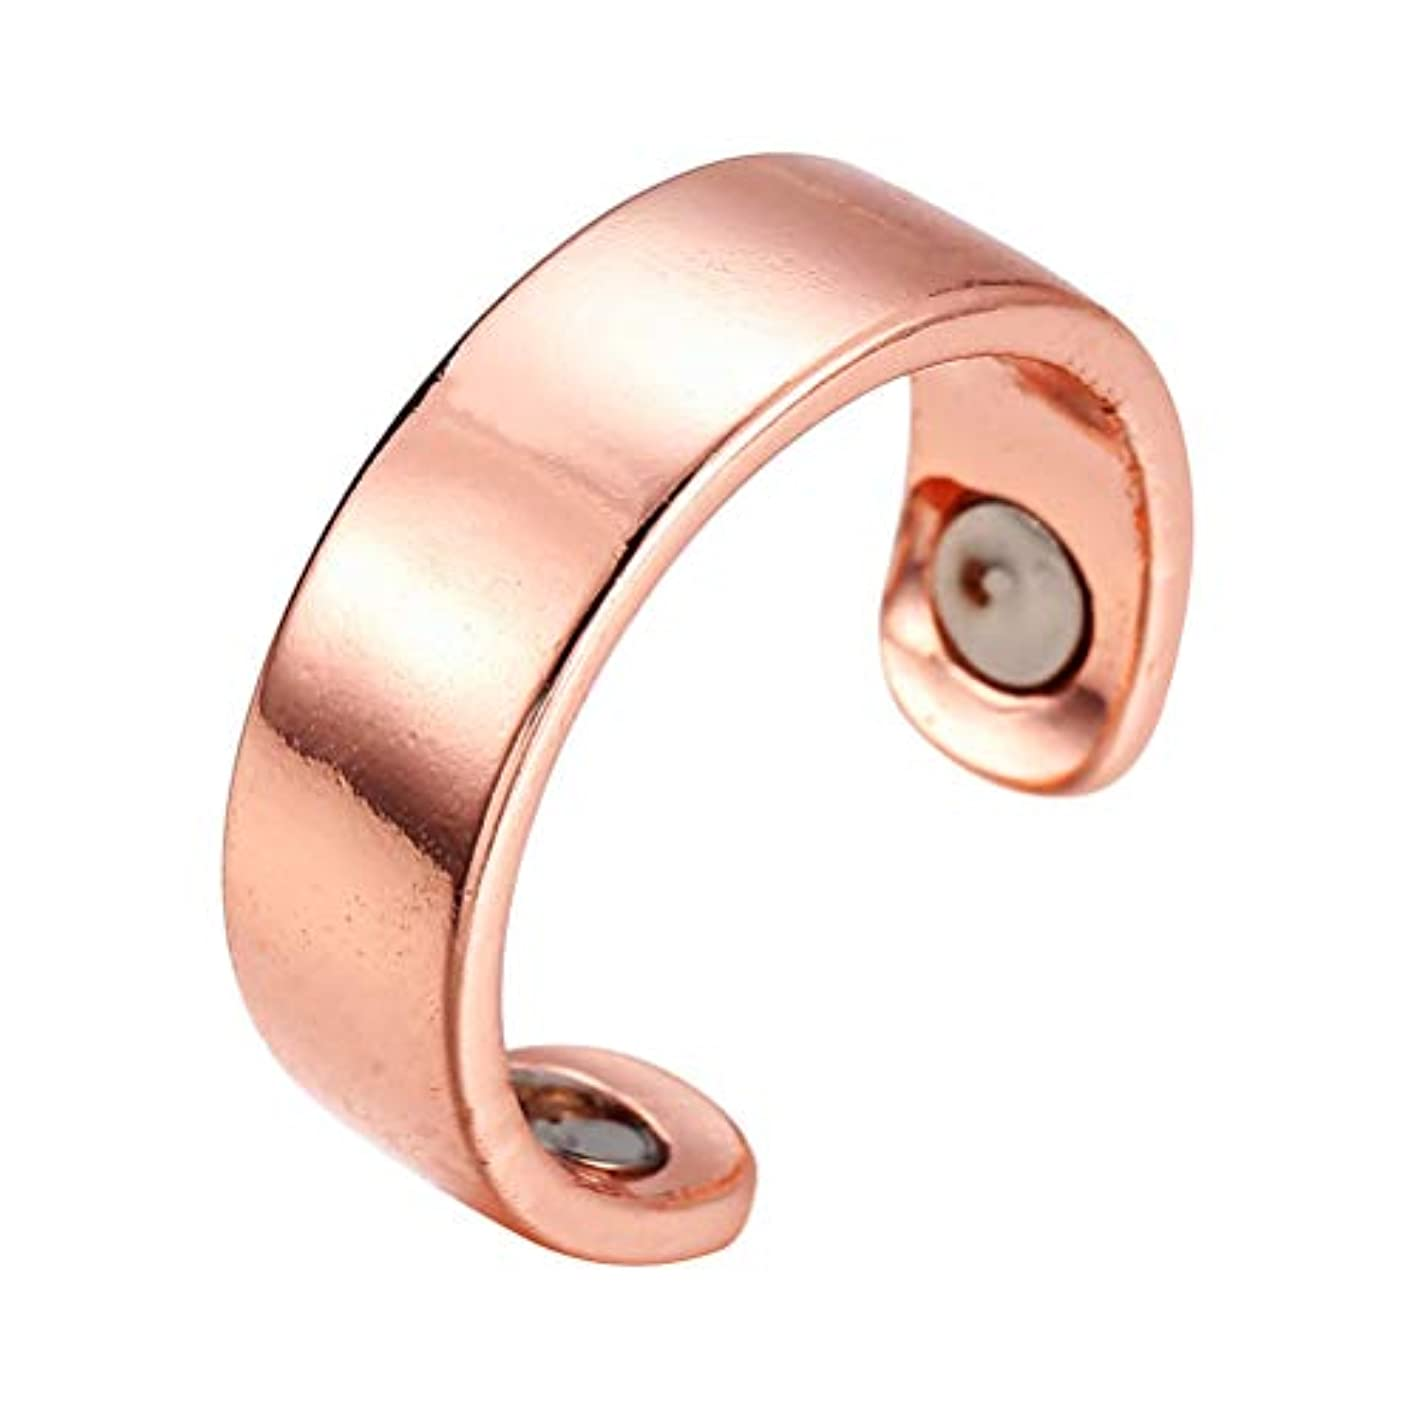 HEALIFTY 指圧マッサージ指輪防止いびきリング息切れ指圧治療ヘルスケア磁気療法健康的な睡眠リング開環(釉、ローズゴールデン)